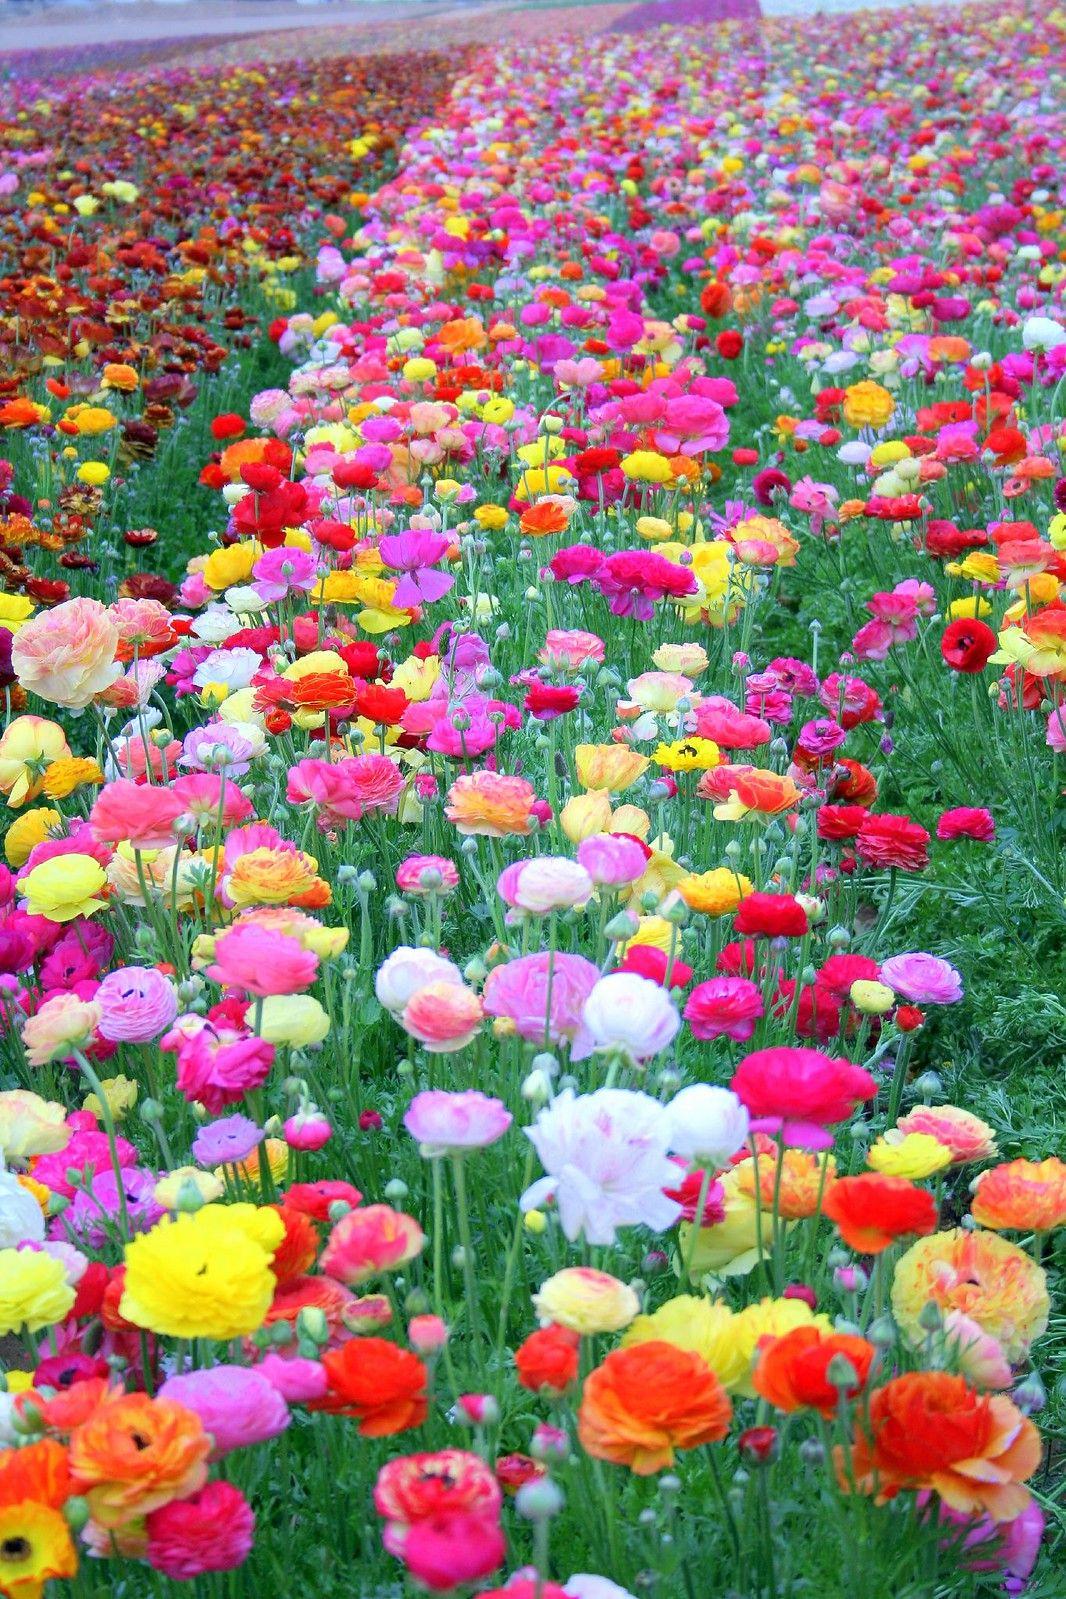 Spring Has Sprung Beautiful Flowers Wallpapers Beautiful Flowers Beautiful Flowers Garden Amazing flower video wallpapers